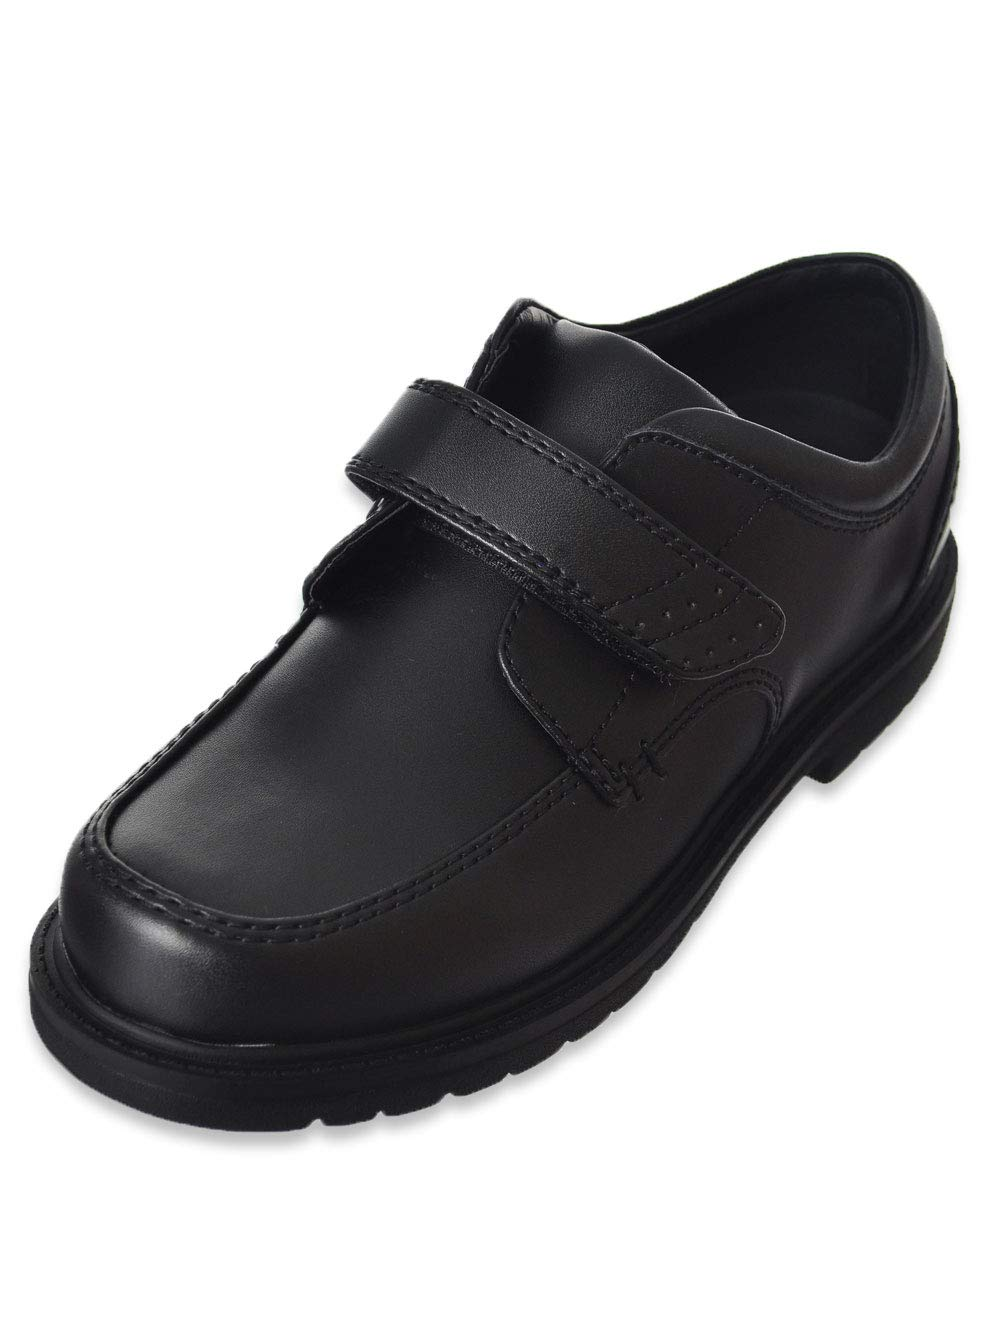 Academie Gear Boys' Inside School Uniform Shoe Black 1 Medium US Little Kid